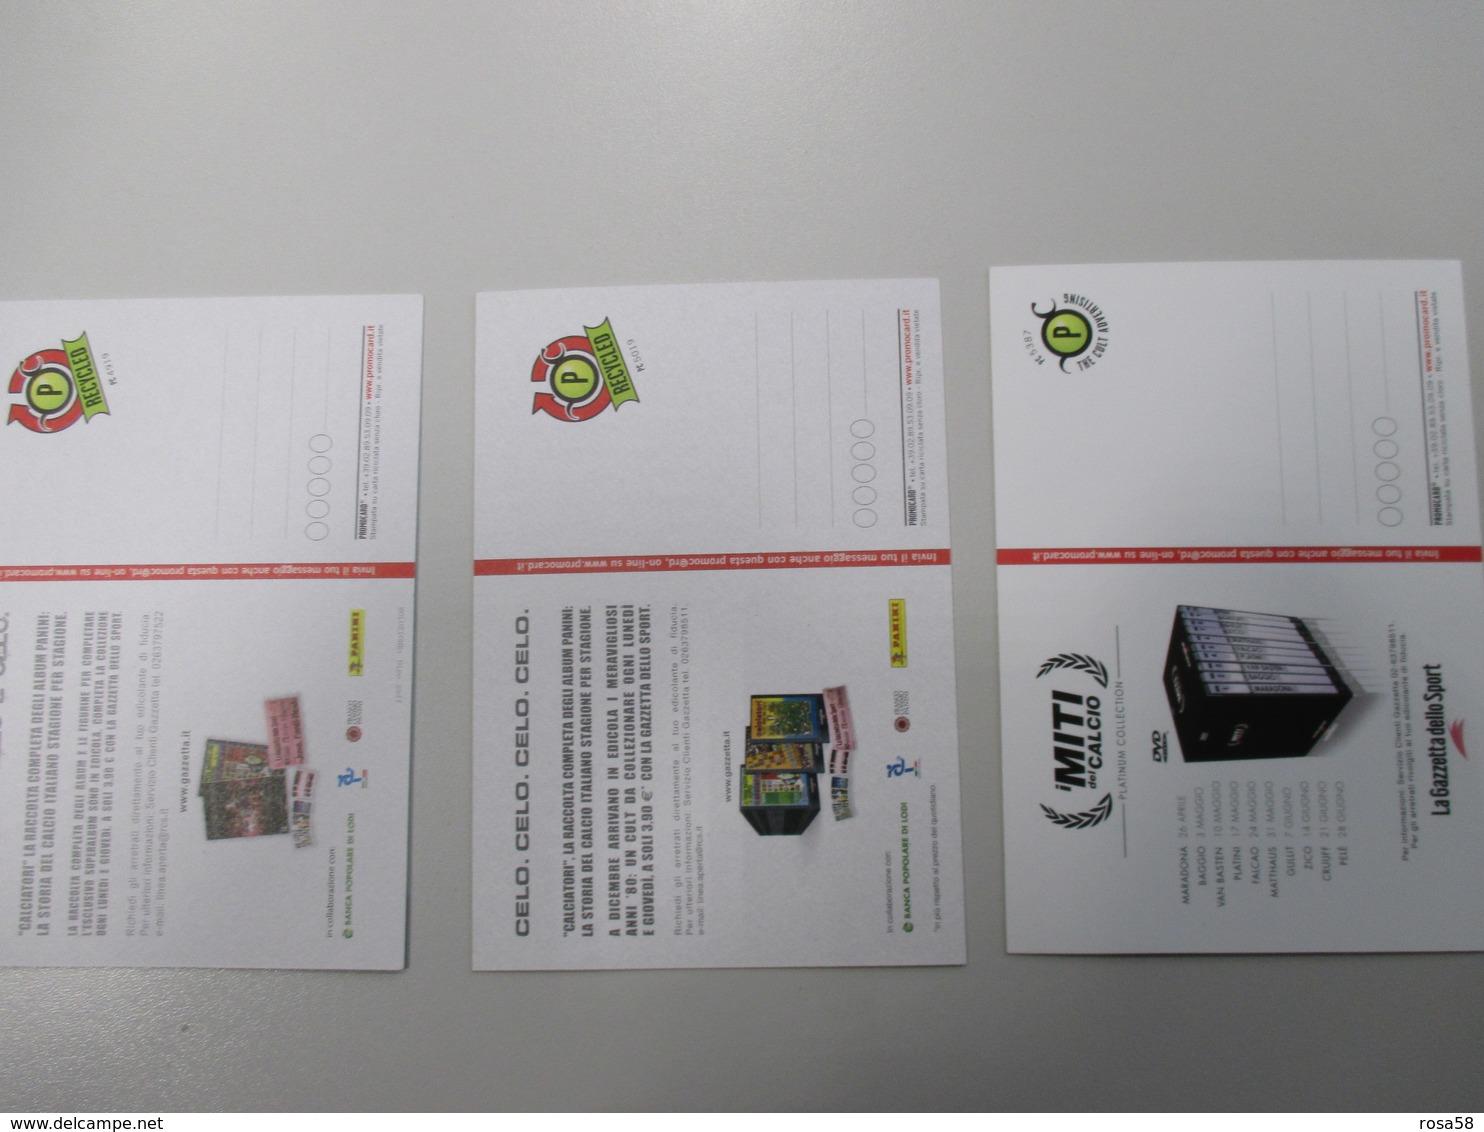 CALCIO Soccer Football Maradona Ramon Angel DIAZ Dino Zoff Promocard N.3 Cartoline Differenti - Calcio